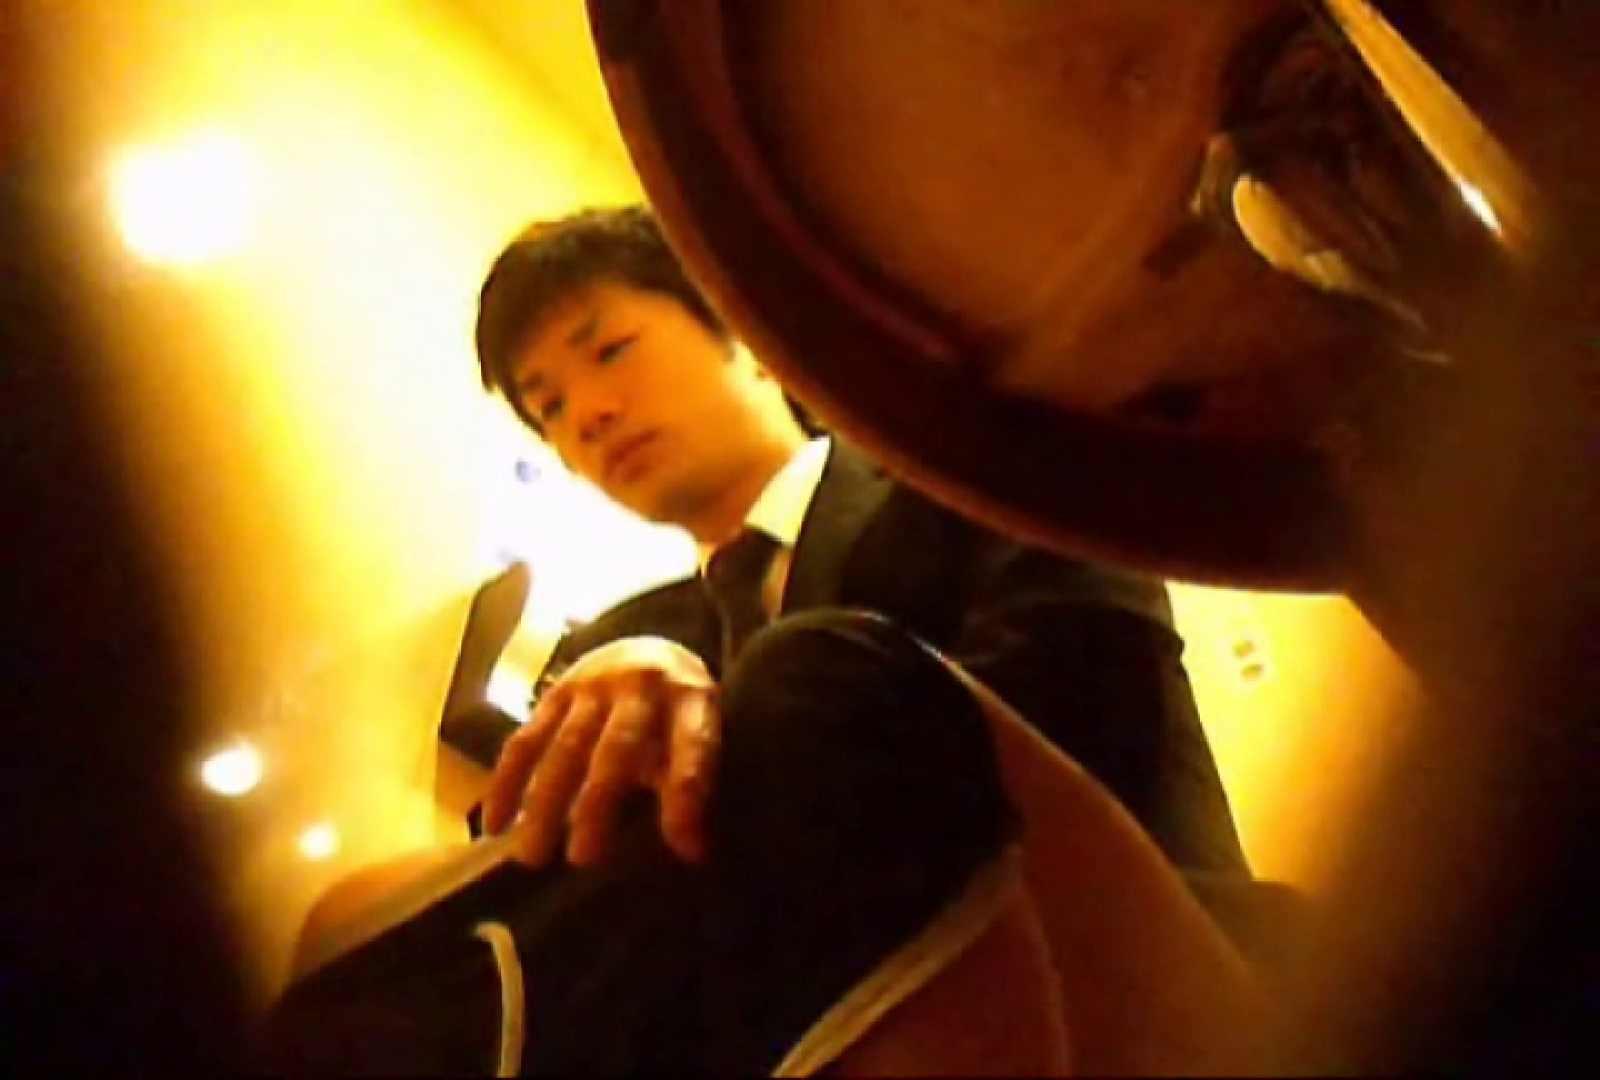 SEASON 3rd!掴み取りさんの洗面所覗き!in新幹線!VOL.23 完全無修正  81pic 79